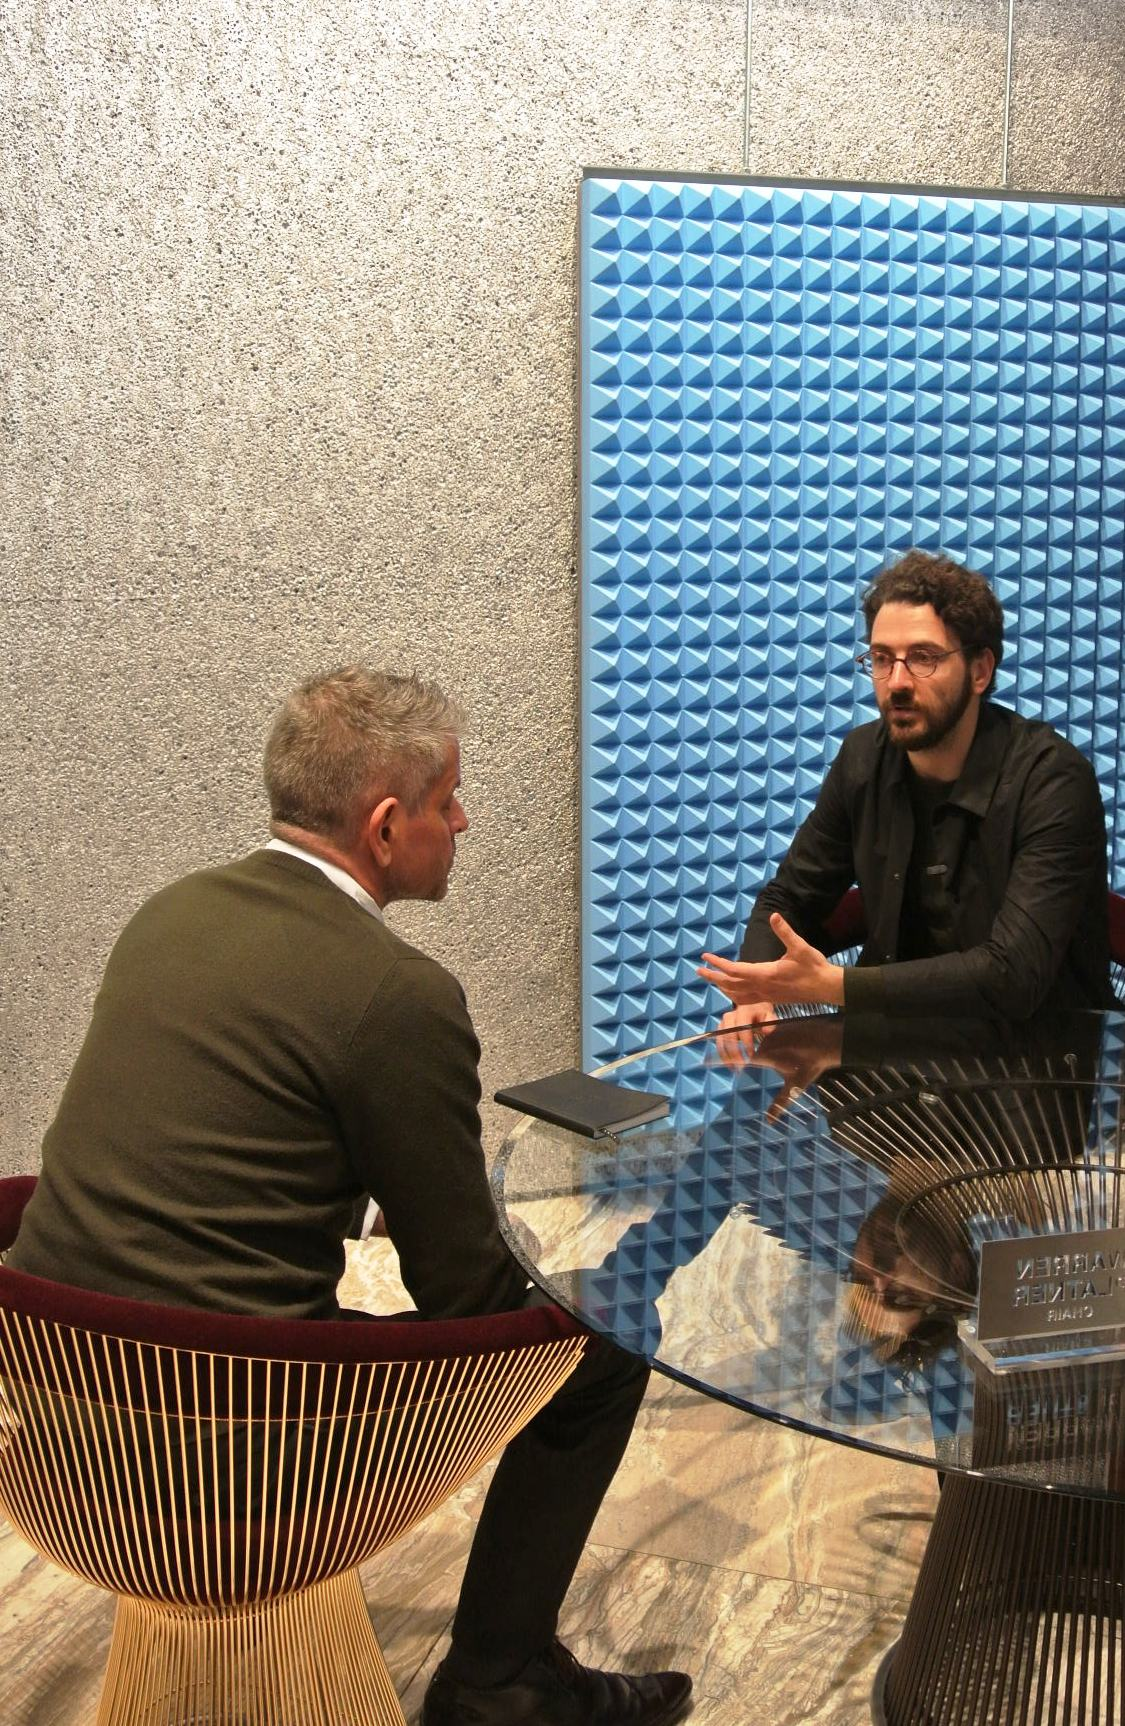 dedece's michael interviewing OMA designer